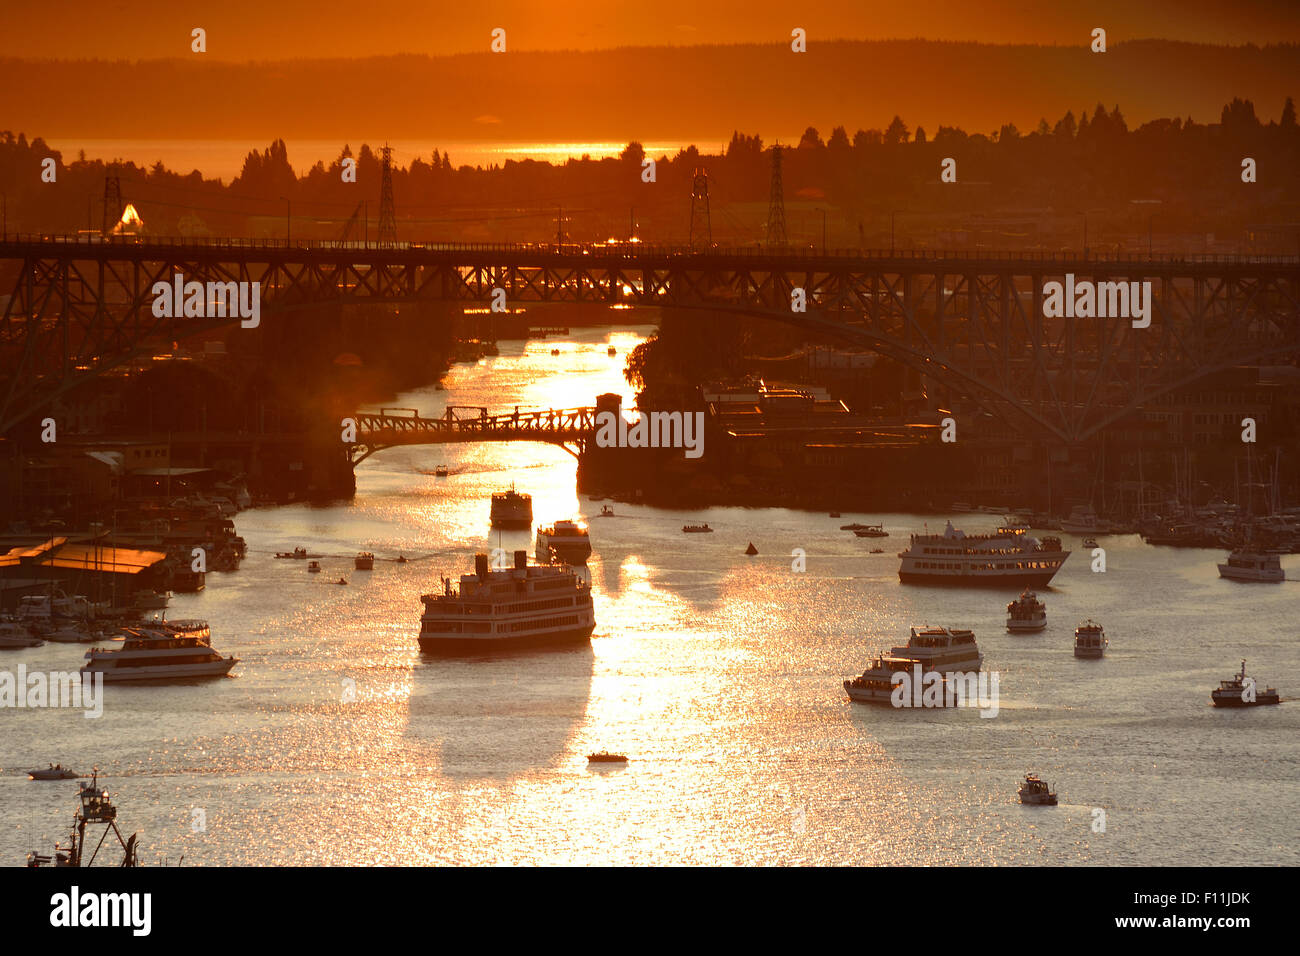 Aerial view of ships on Lake Union at sunset, Seattle, Washington, United States Stock Photo